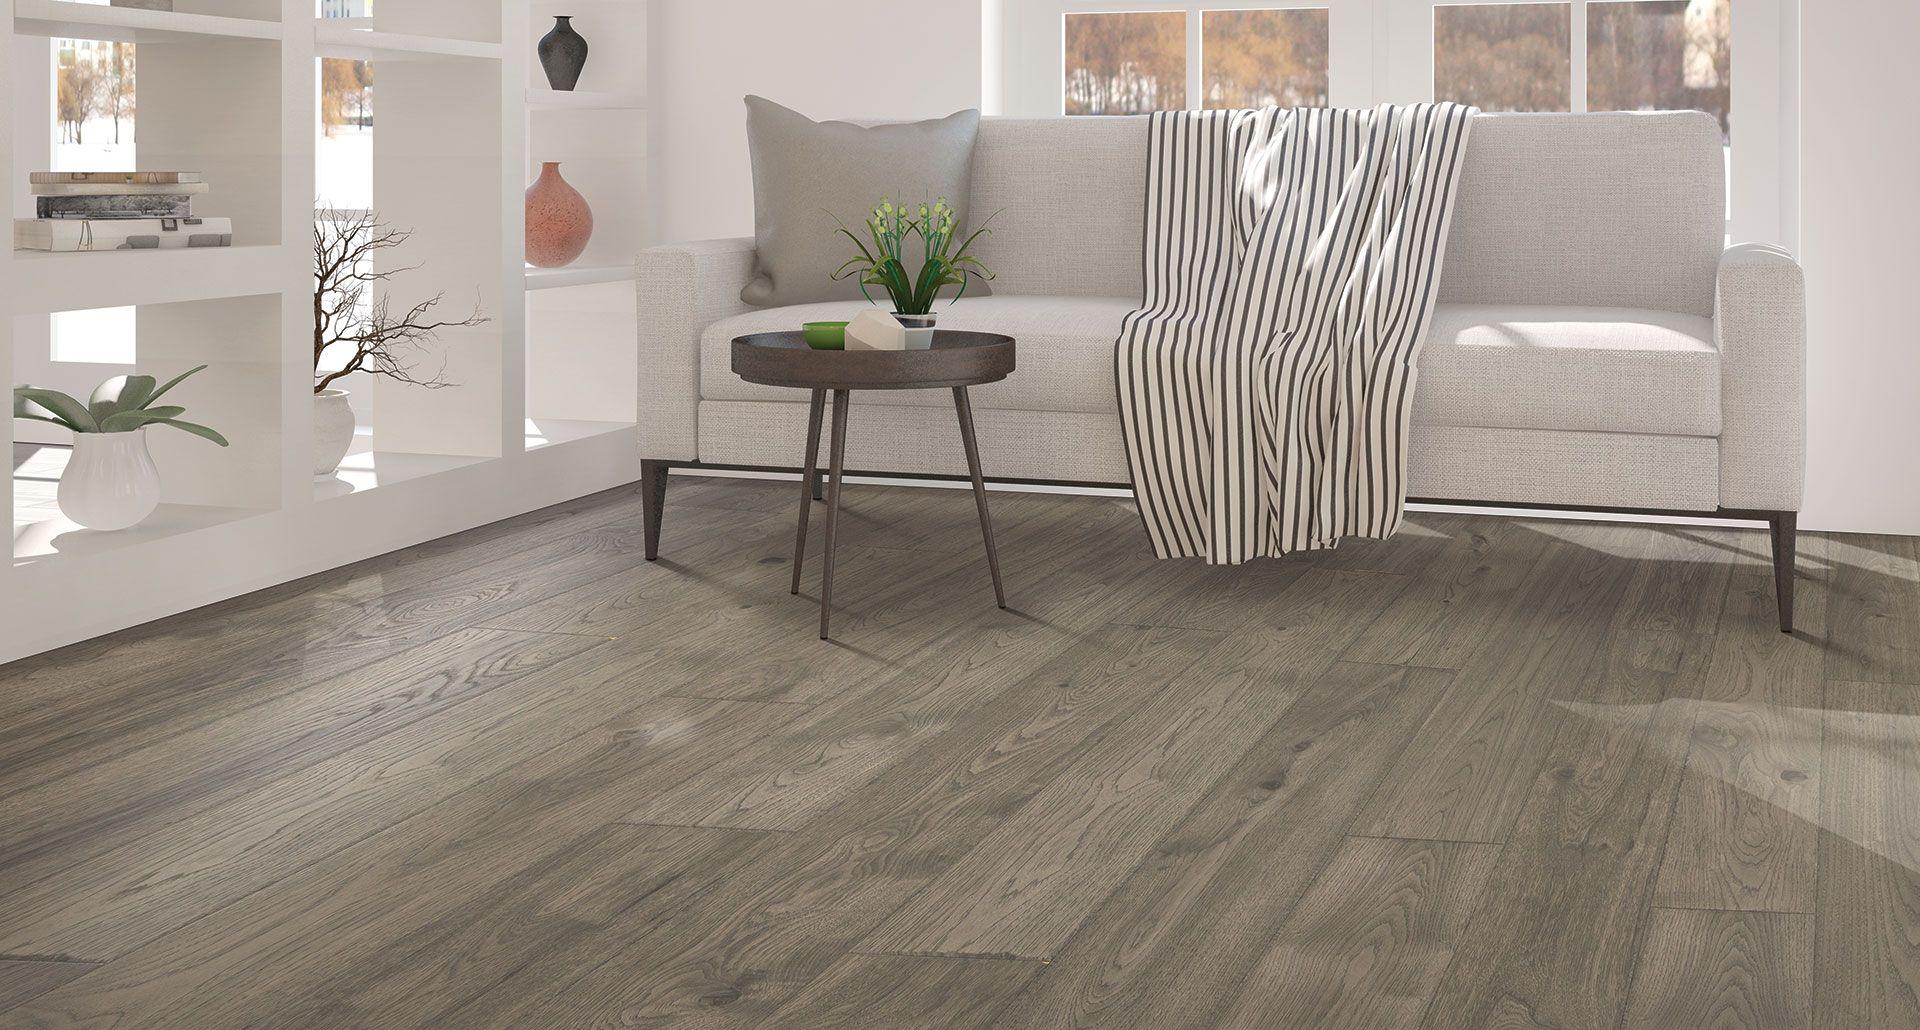 Professional Dark Grey Oak Laminate Flooring Brown Laminate Flooring Grey Wood Floors Bedroom Hardwood Floor Colors